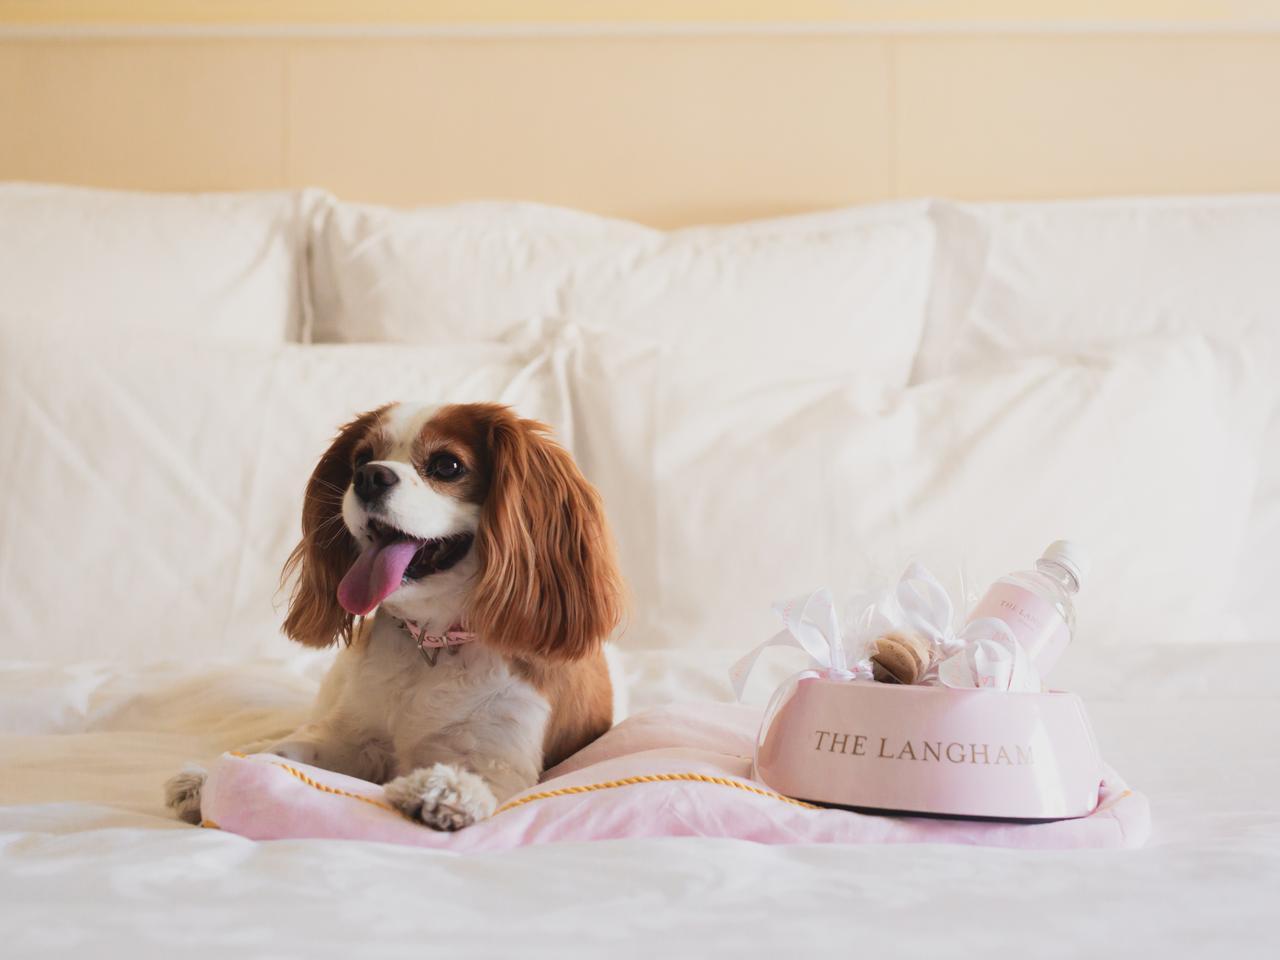 A dog at The Langham luxury hotel, Sydney.